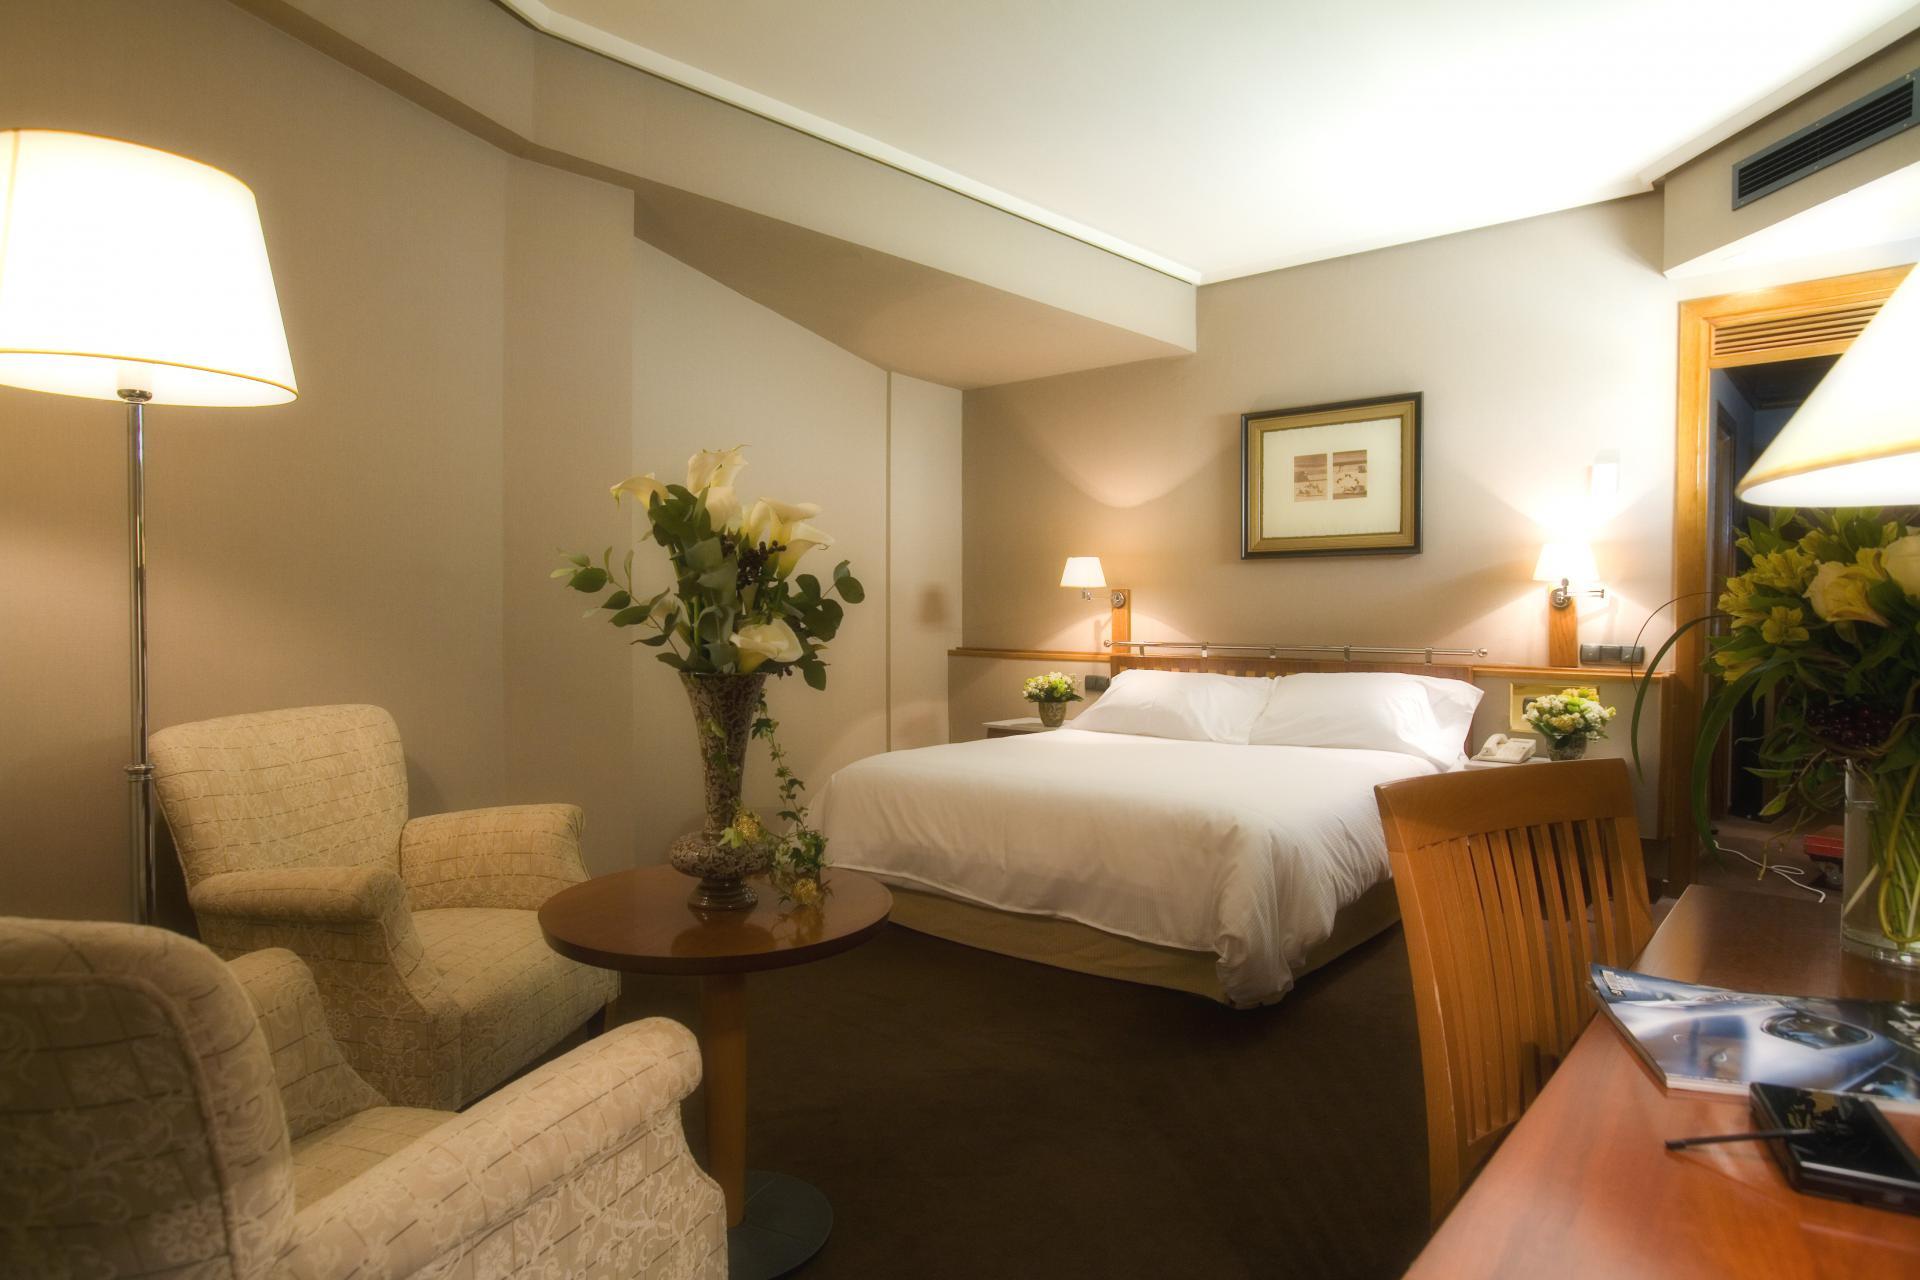 Chambres hotel palafox hotel palafox for Hotel habitacion familiar zaragoza